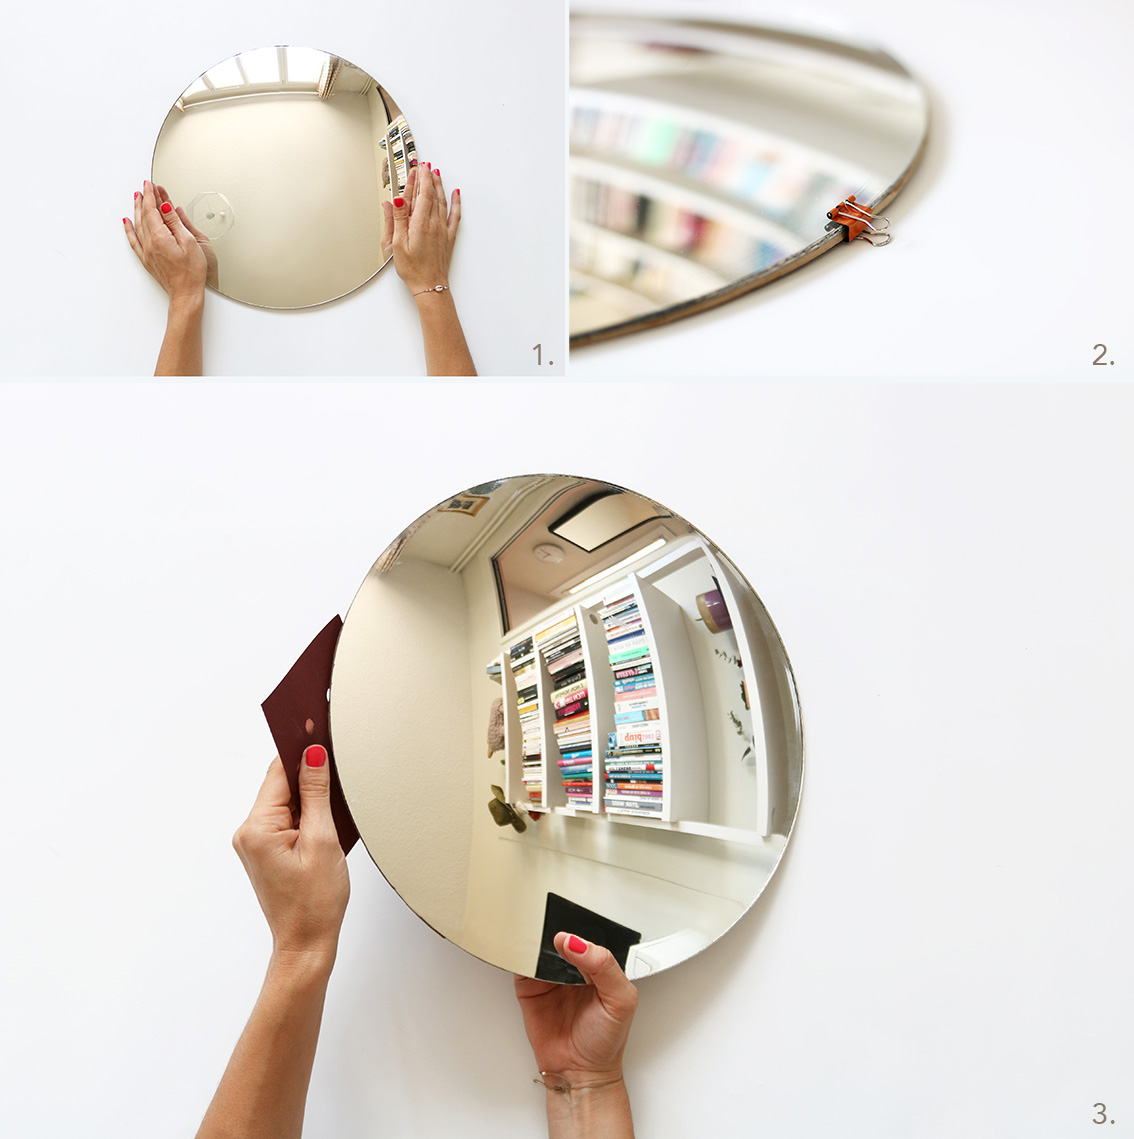 Customiser Un Cadre De Miroir diy miroir rond design pas cher - blog diy mode lyon | artlex